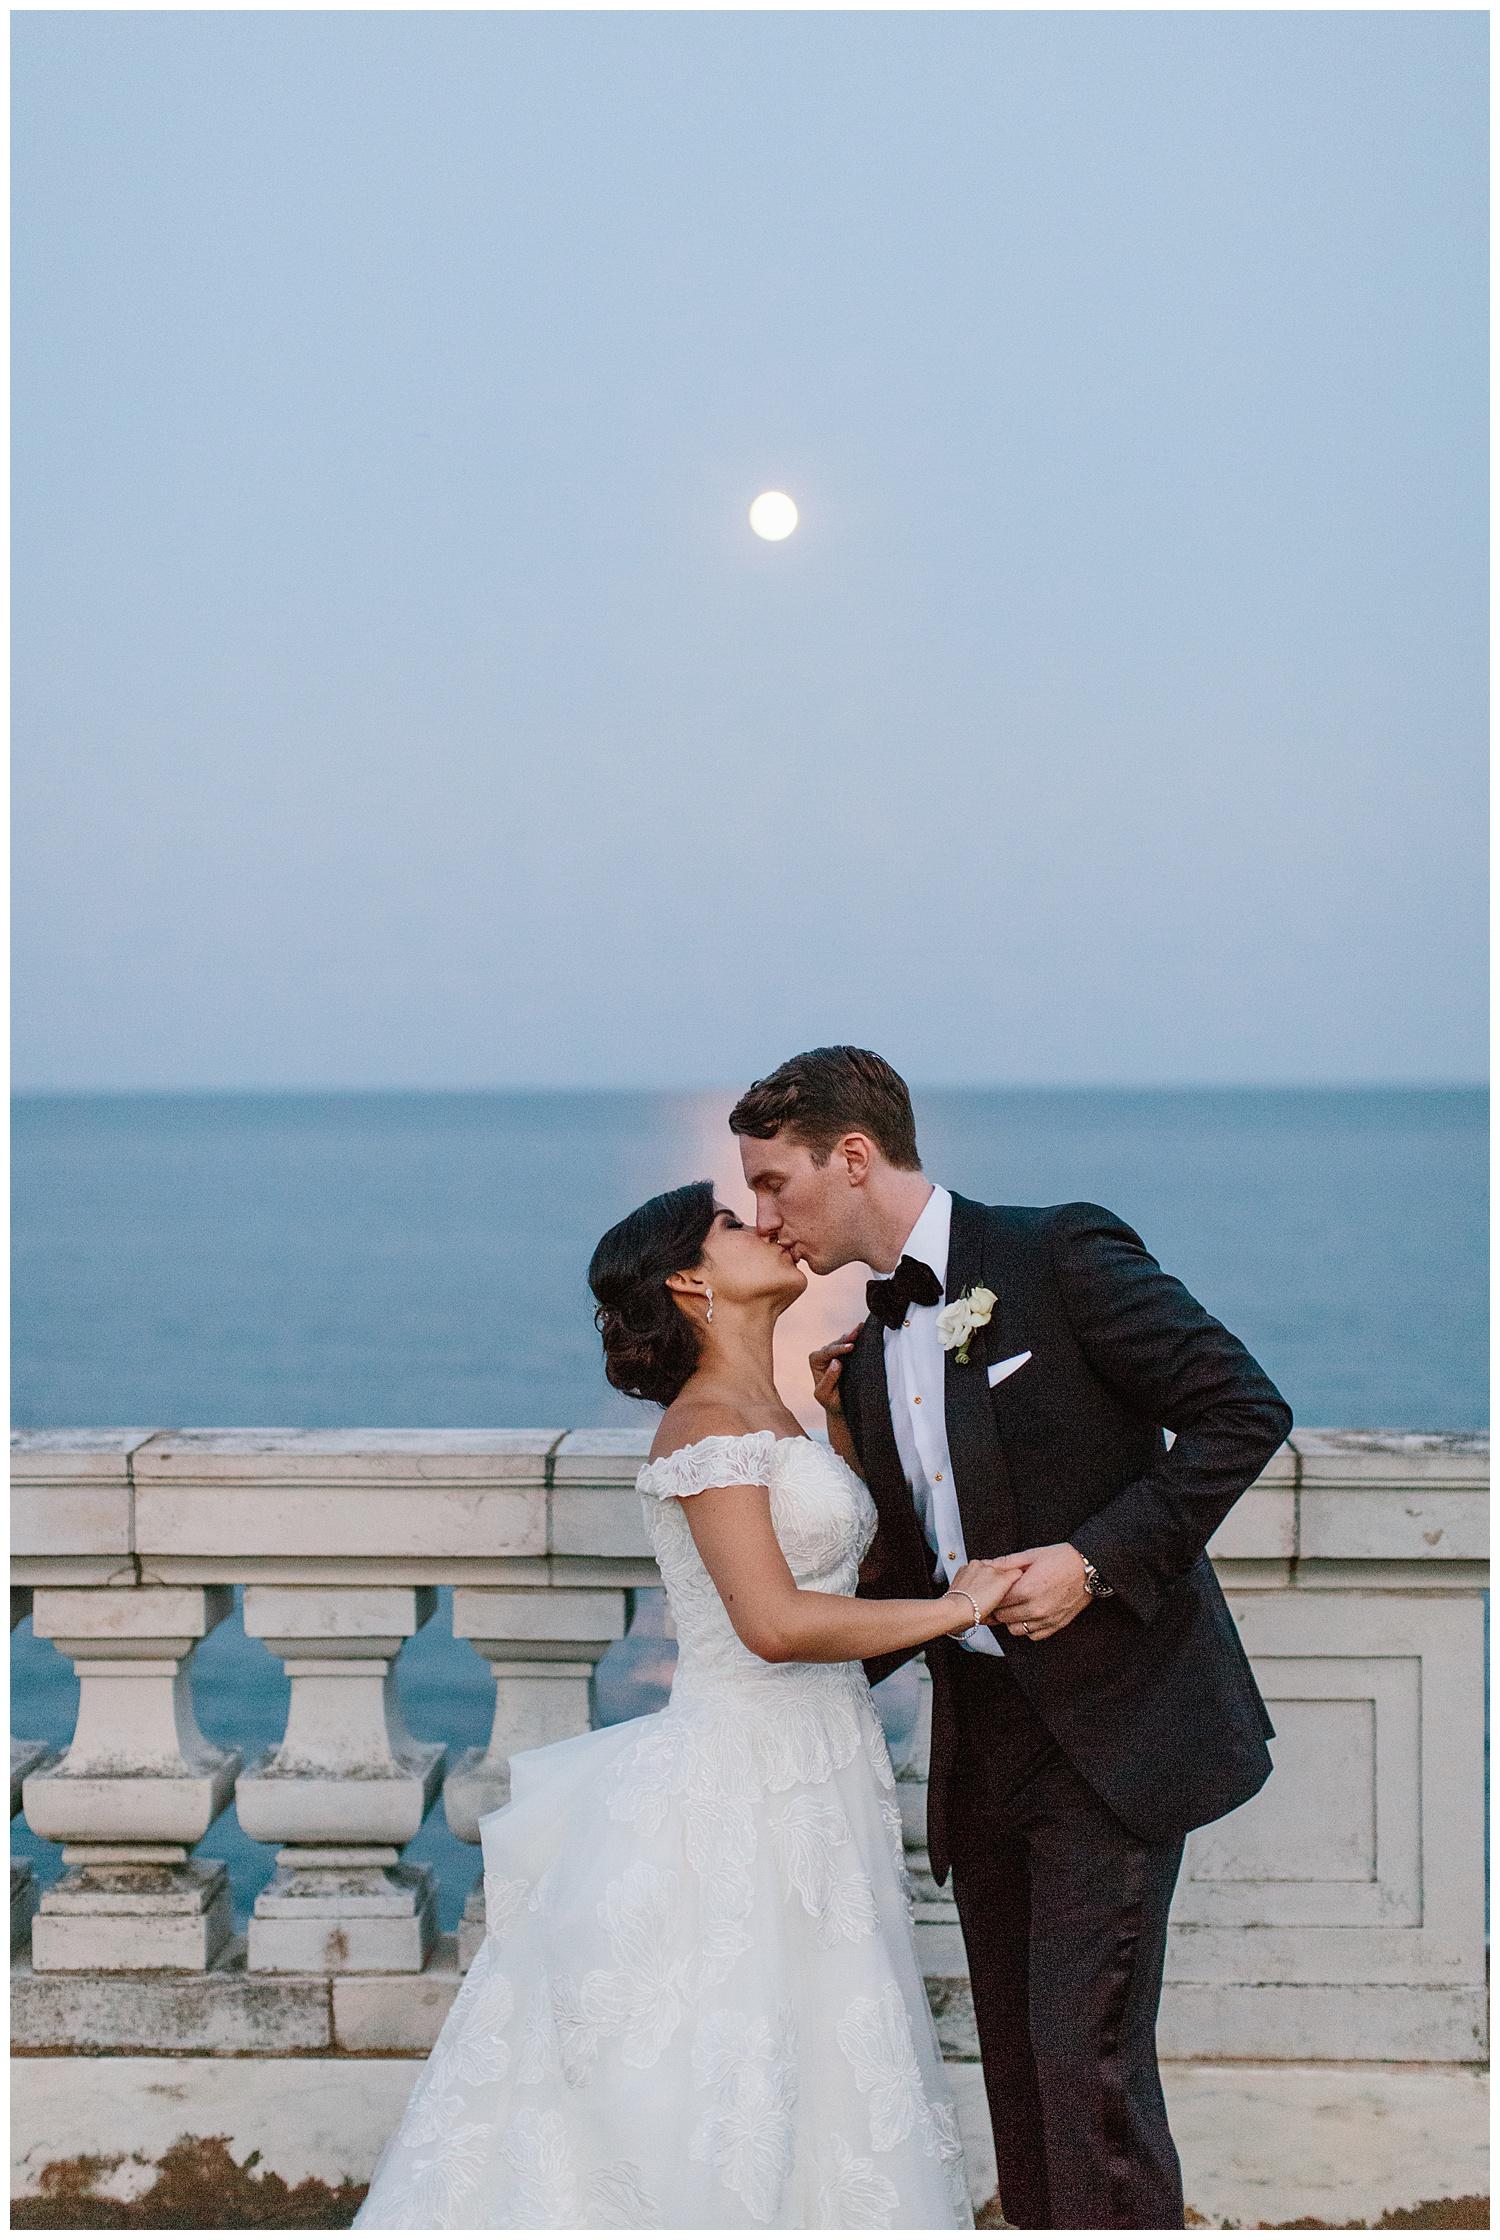 Stephen_Nathalie_Rosecliff_Mansion_Wedding_030.jpeg